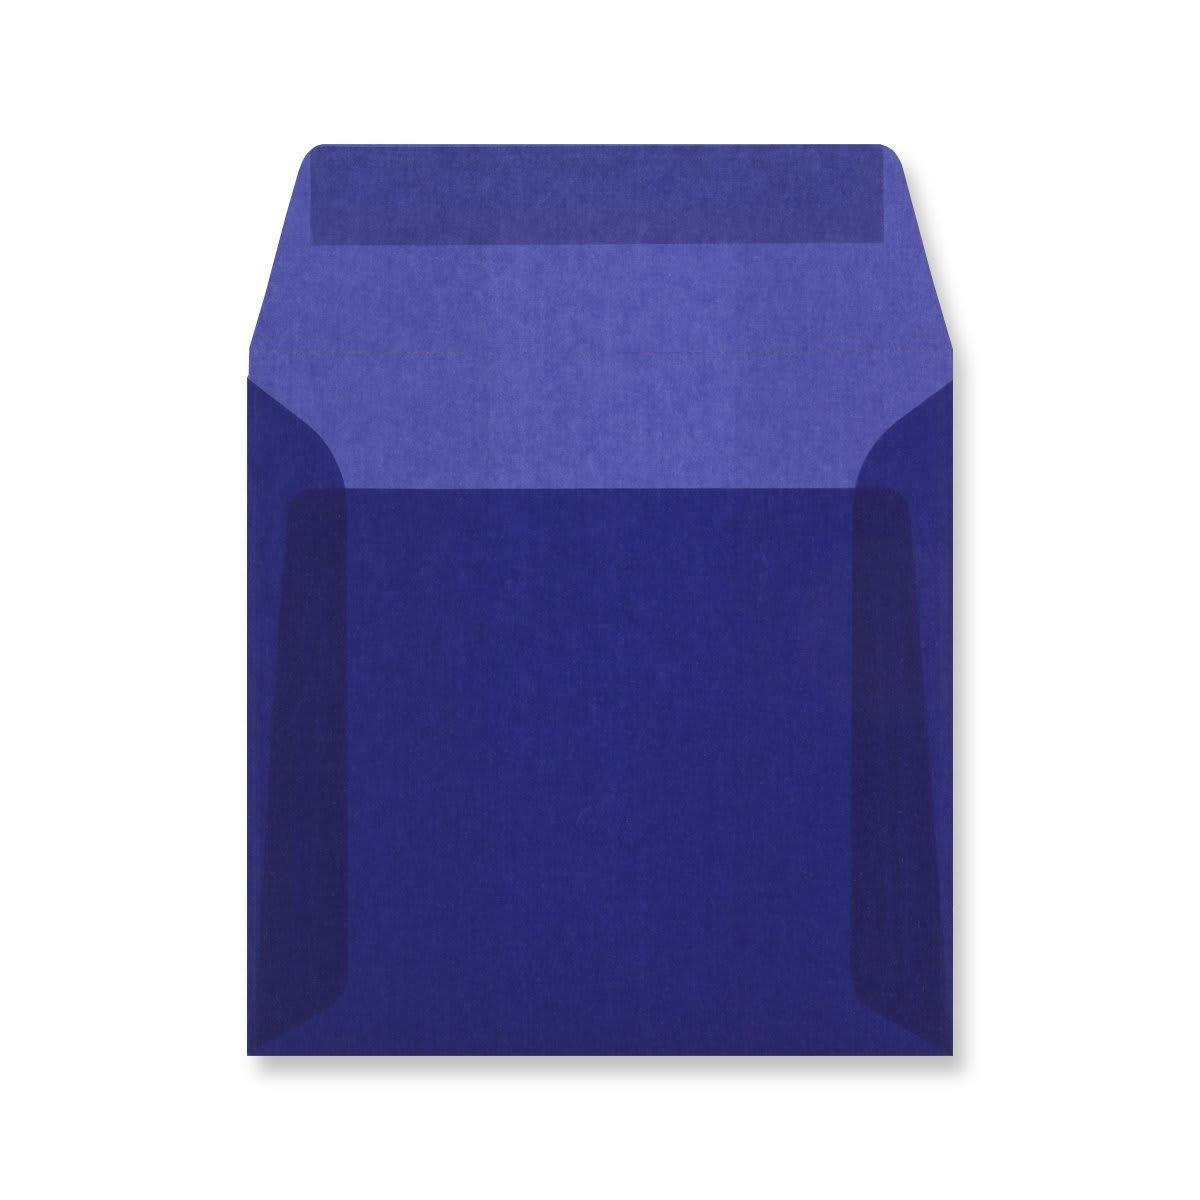 160 x 160MM DARK BLUE TRANSLUCENT ENVELOPES